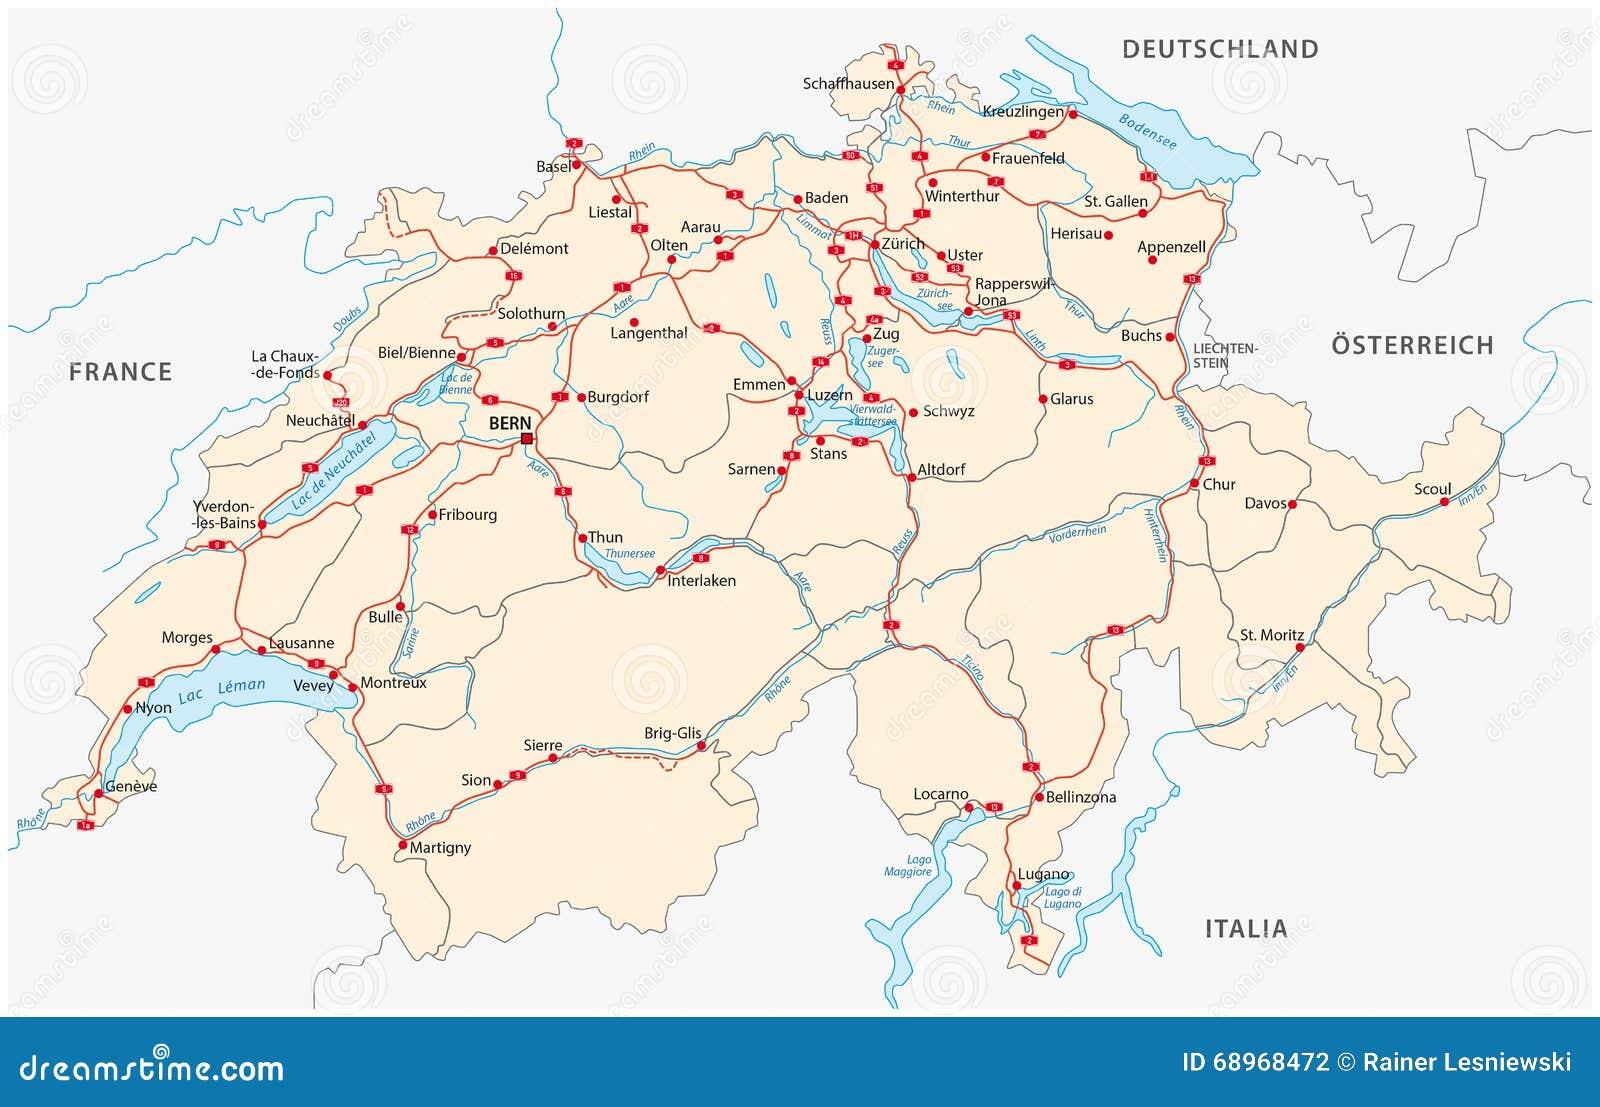 Switzerland road map stock illustration Illustration of abstract